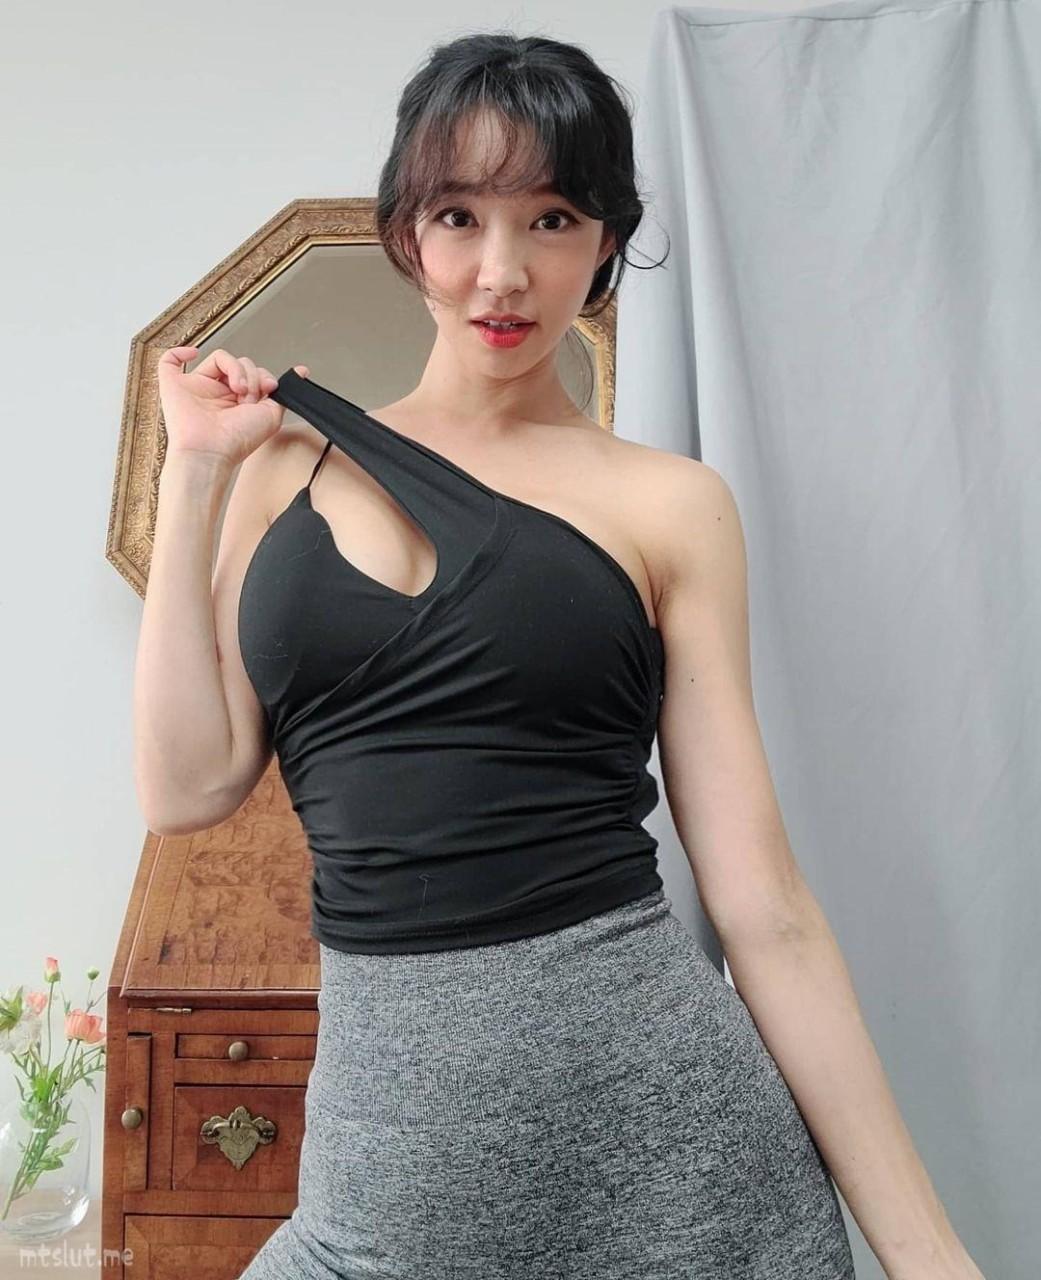 ins妹子图-精选-20210529